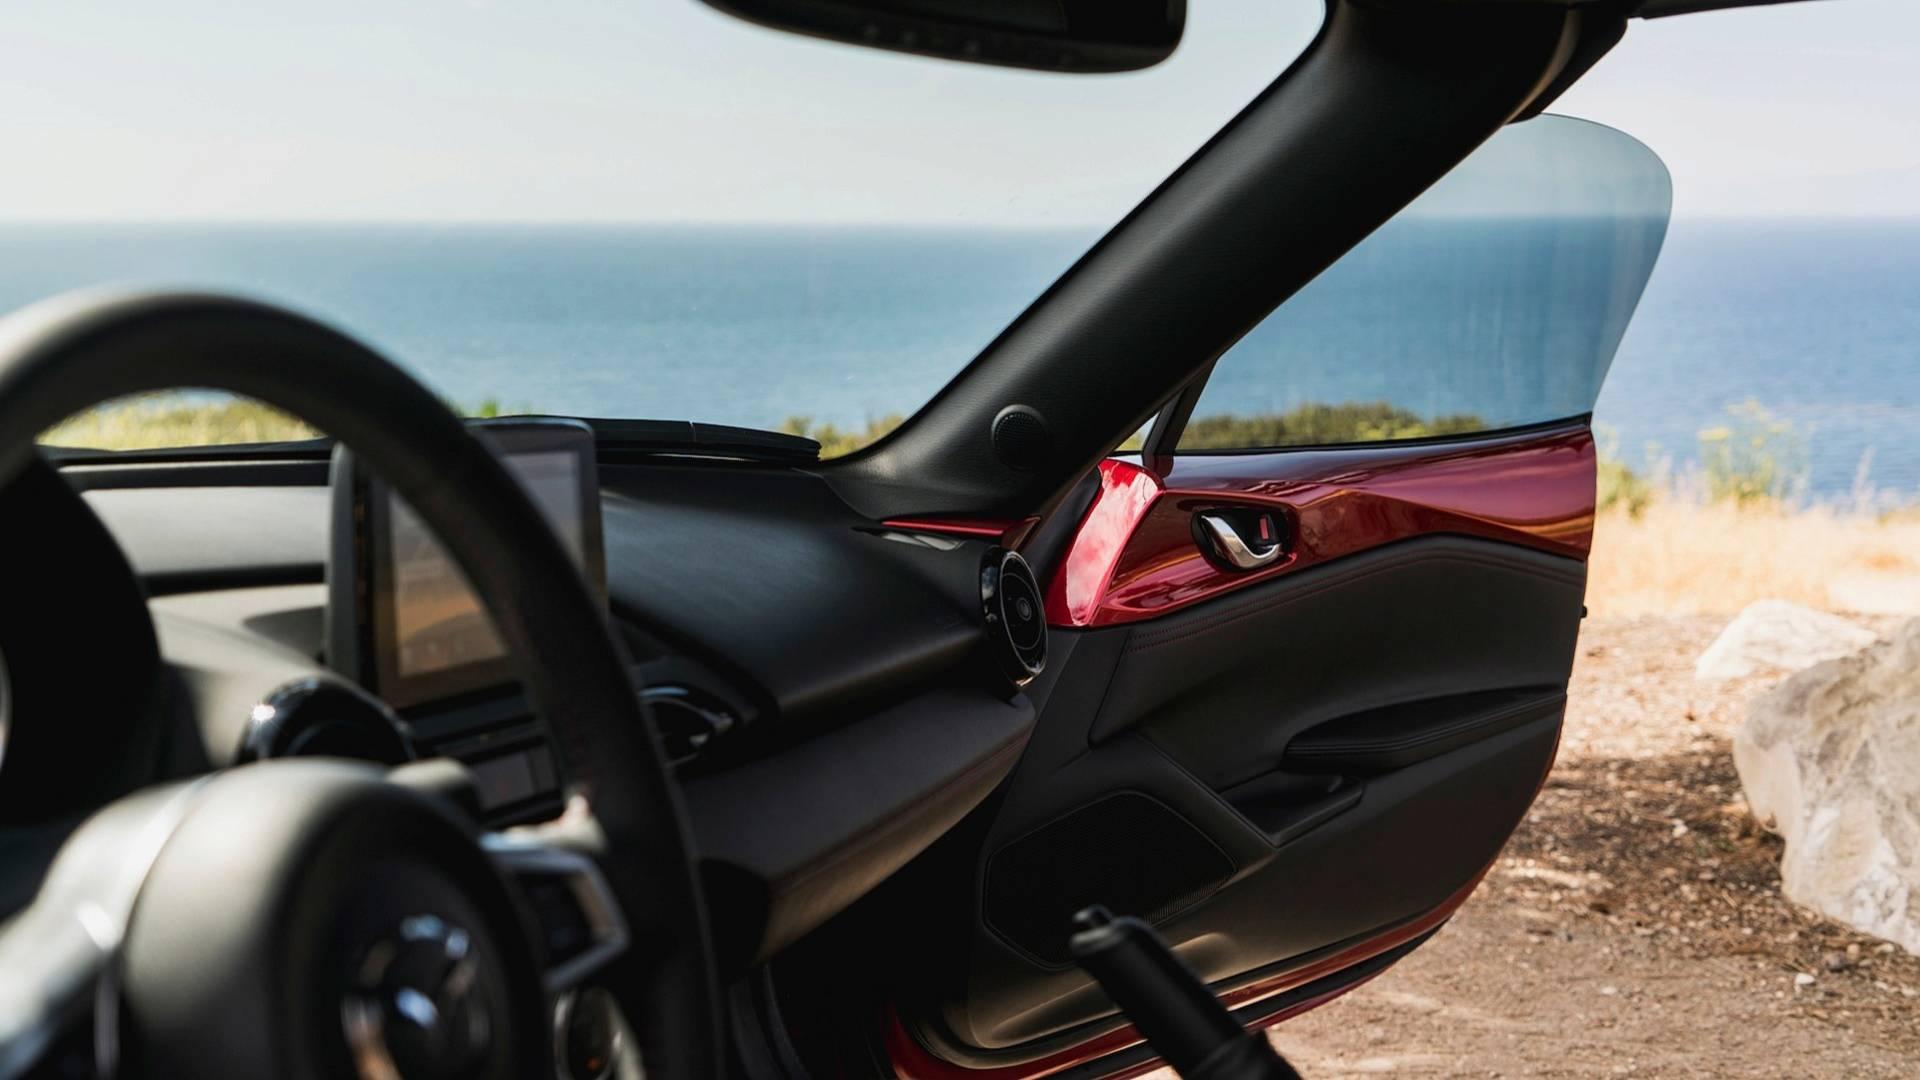 2019 Mazda MX-5 Miata: First Drive